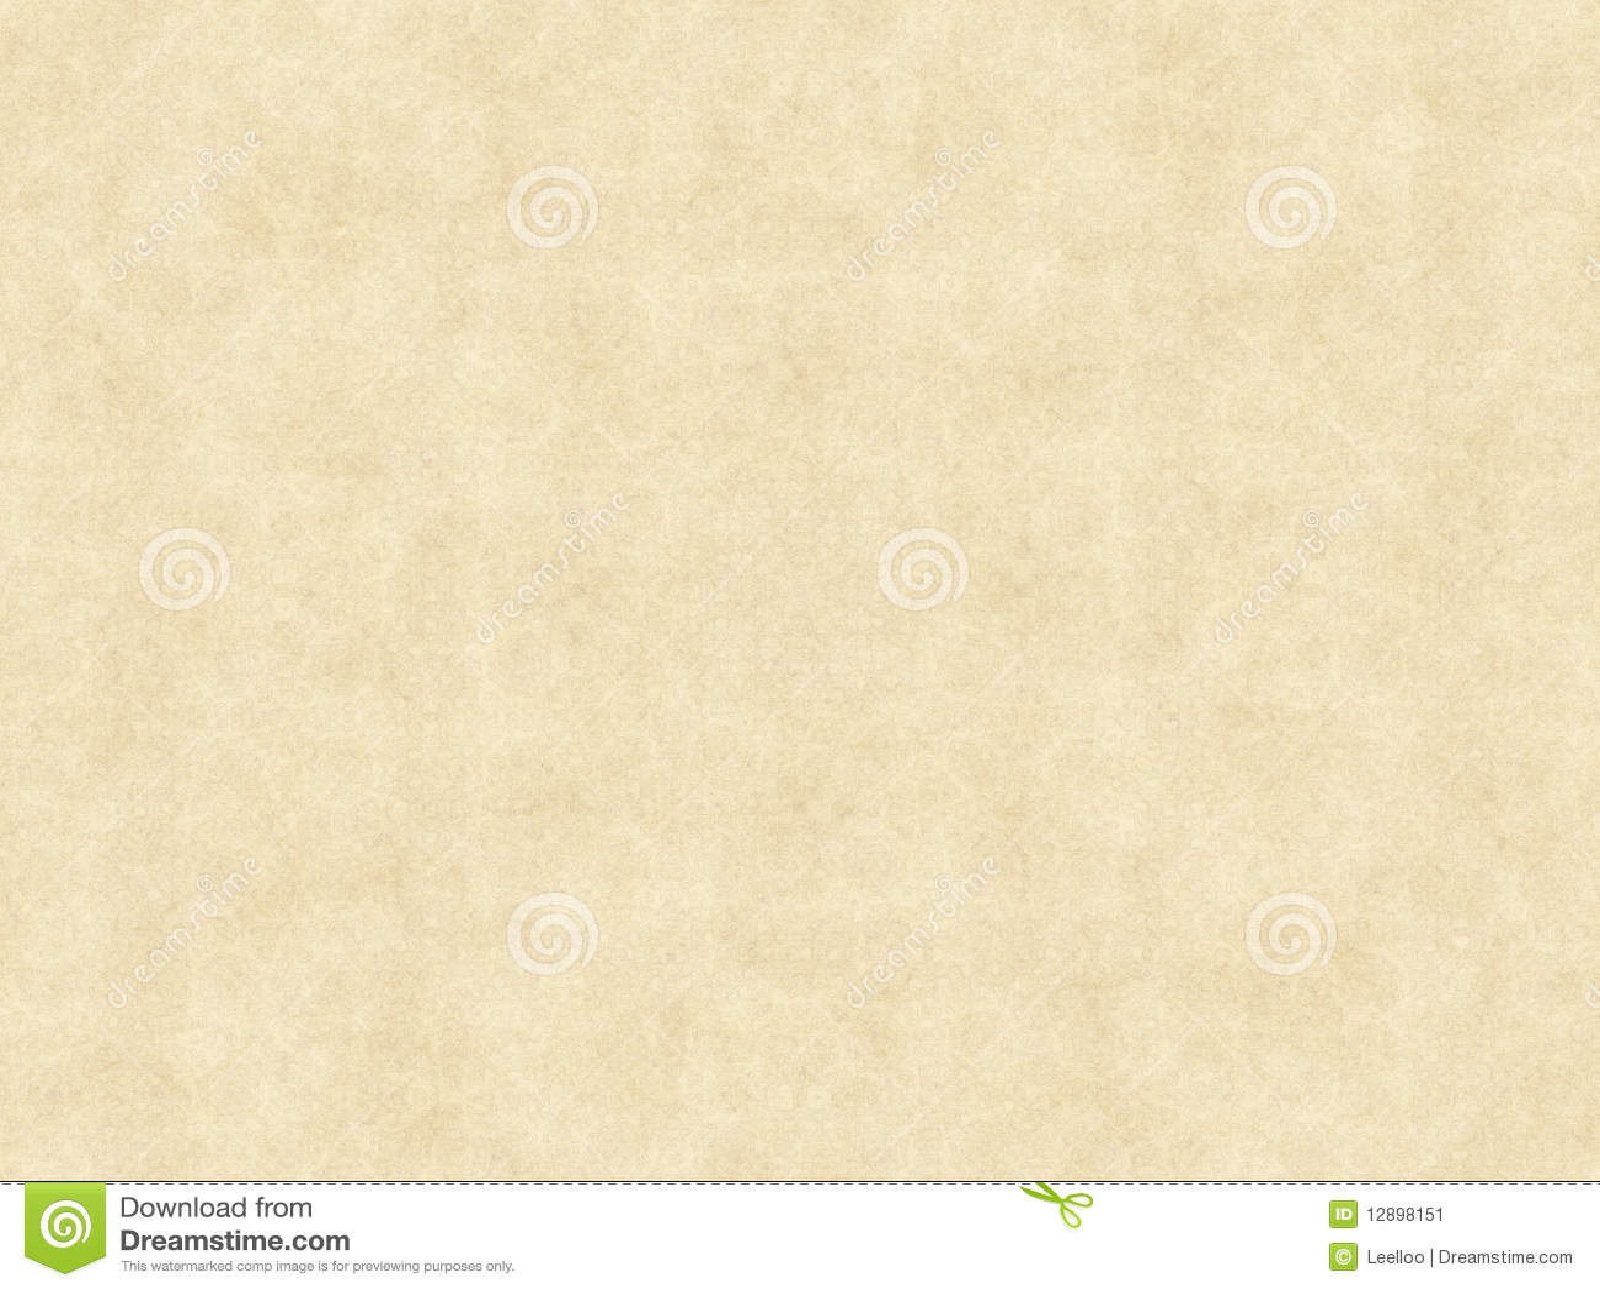 Elegant old paper background texture